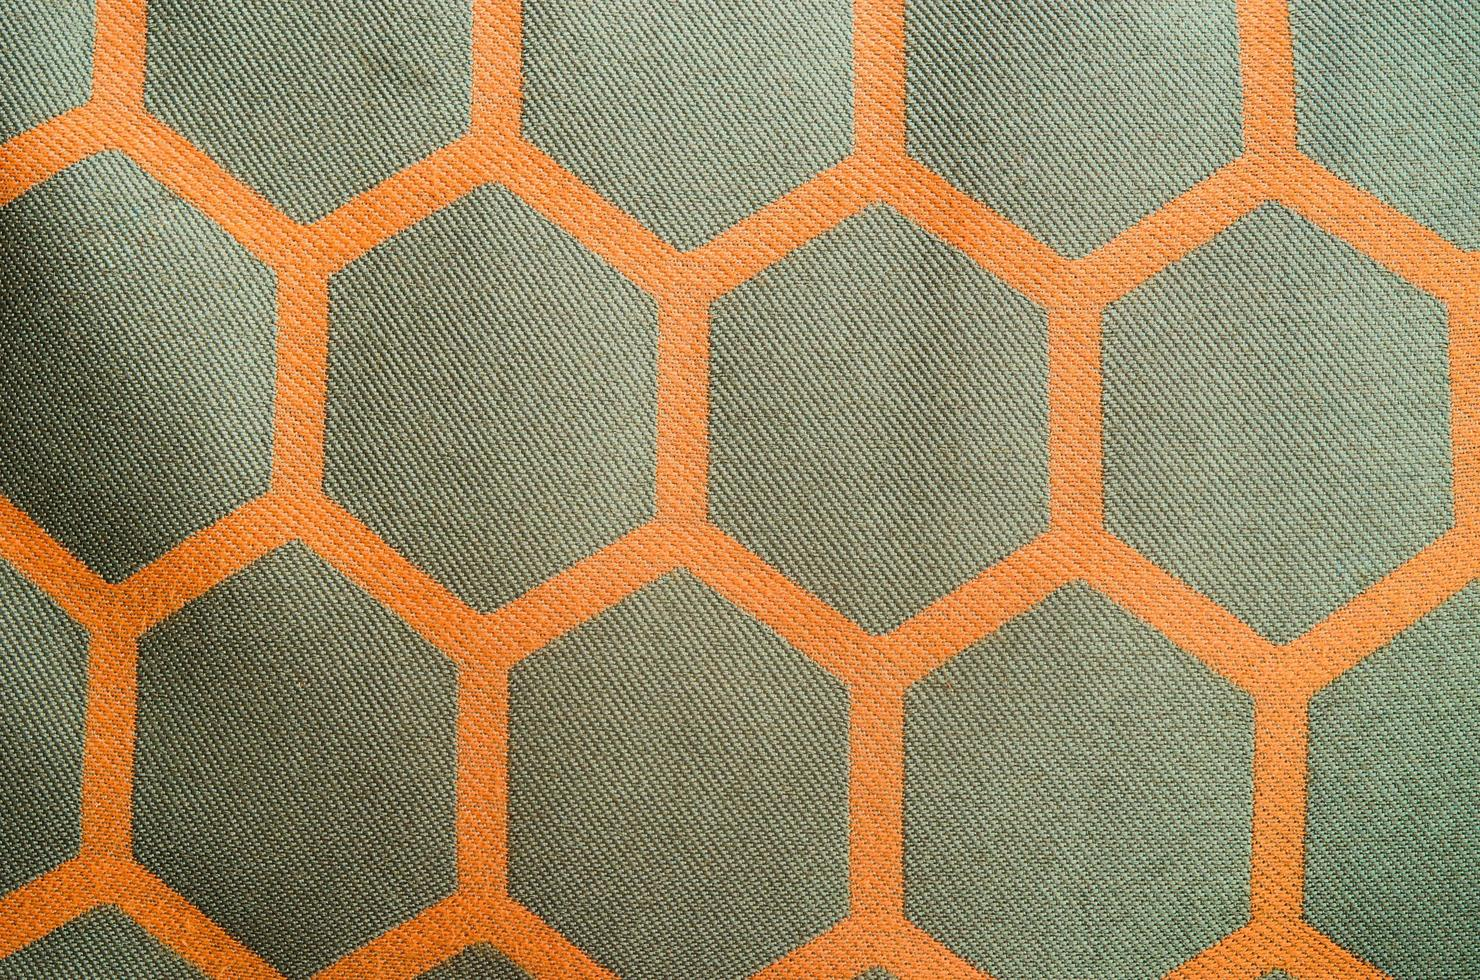 patrón de tela hexagonal foto